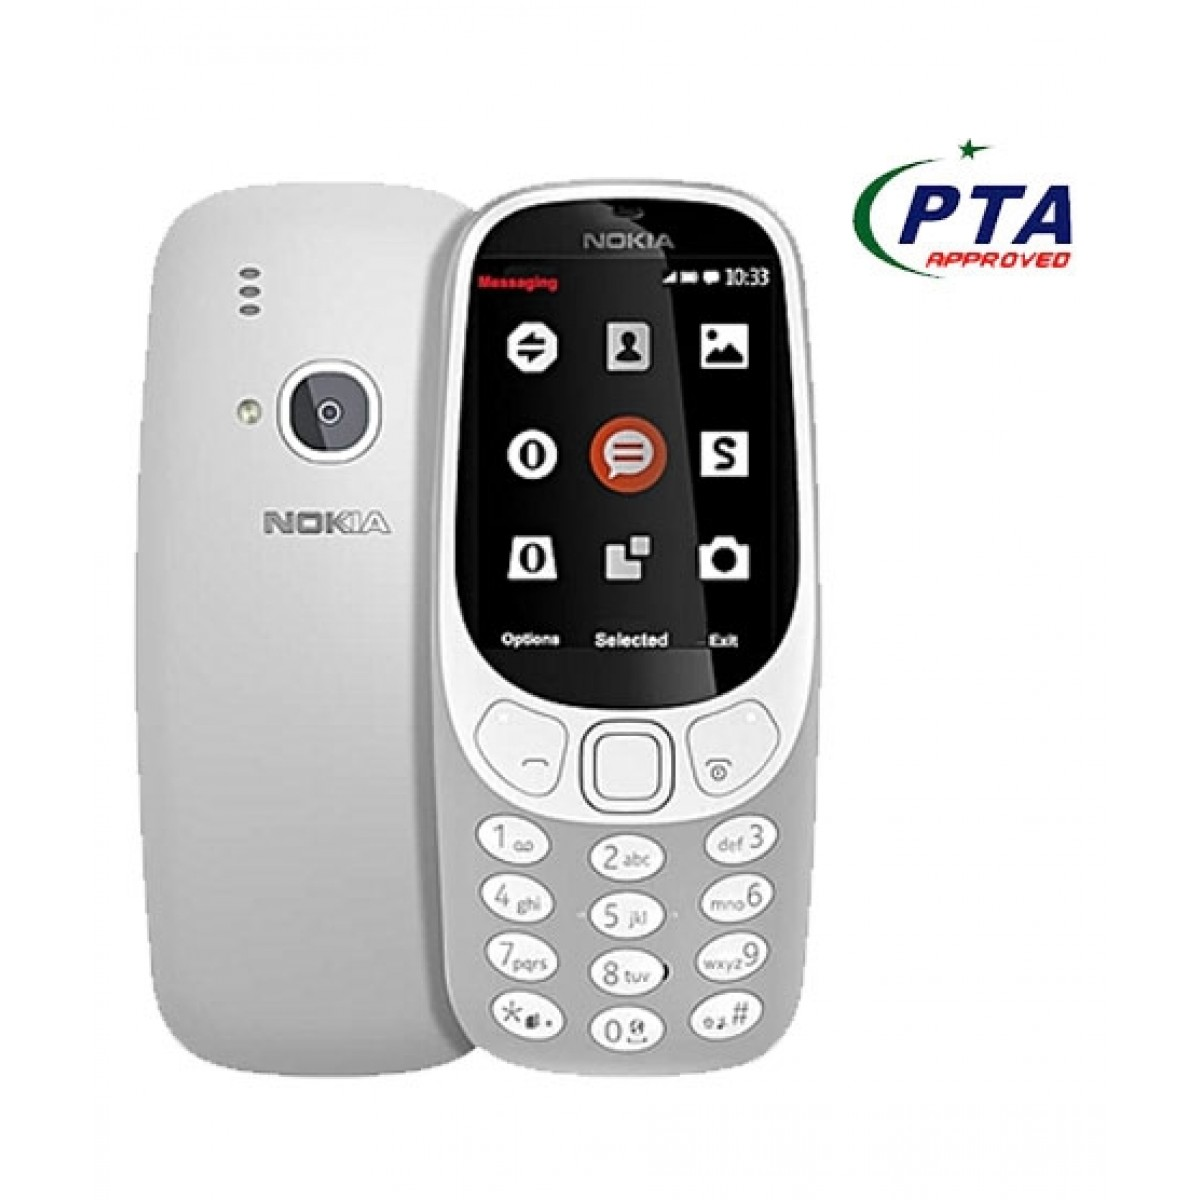 Nokia 3310 Dual SIM Grey Price in Pakistan | Buy Nokia 3310 Dual SIM Grey |  iShopping.pk